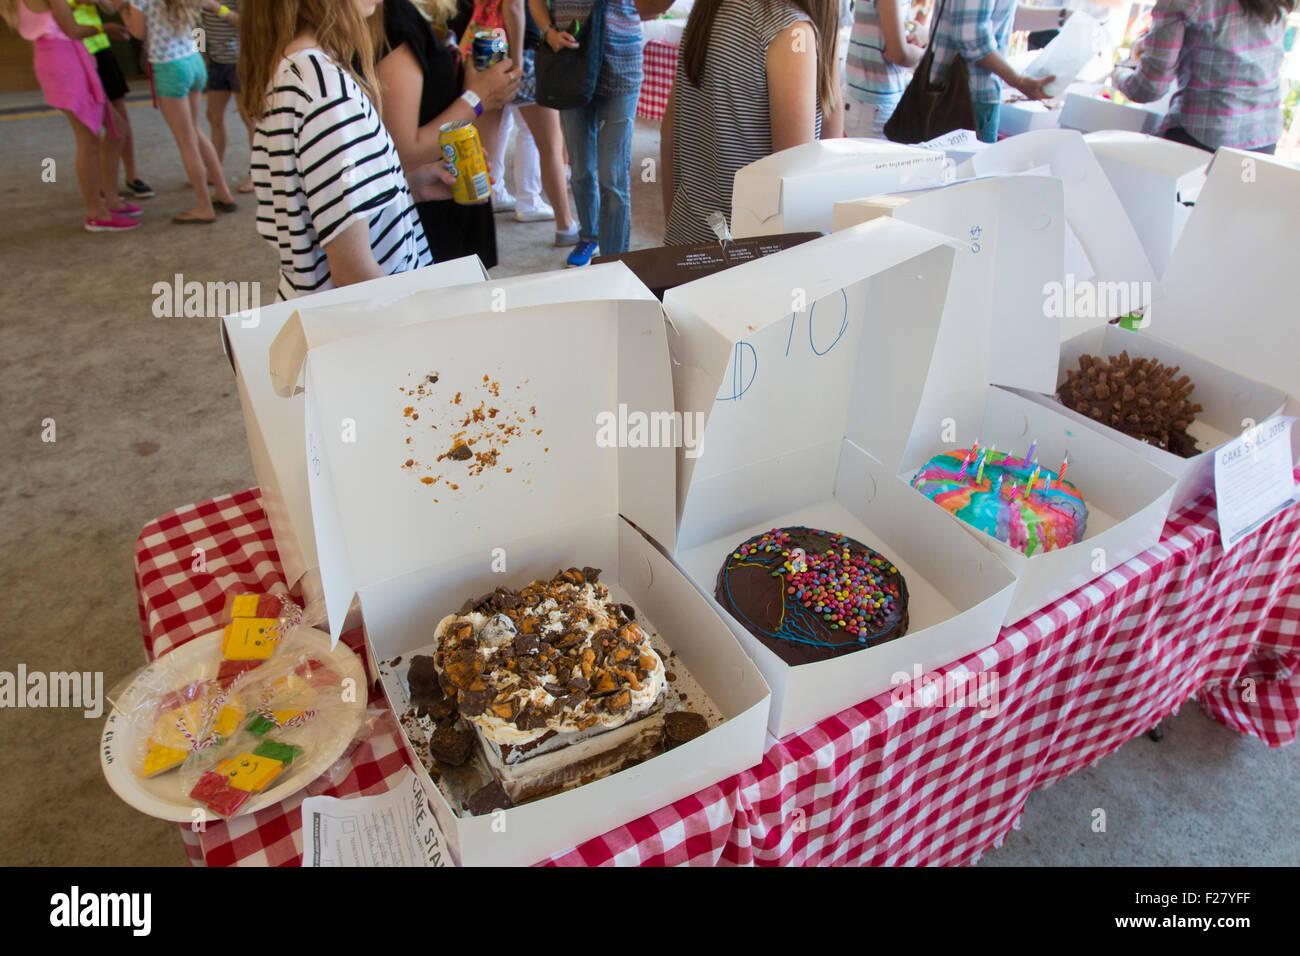 Cake Stall Stock Photos & Cake Stall Stock Images - Alamy